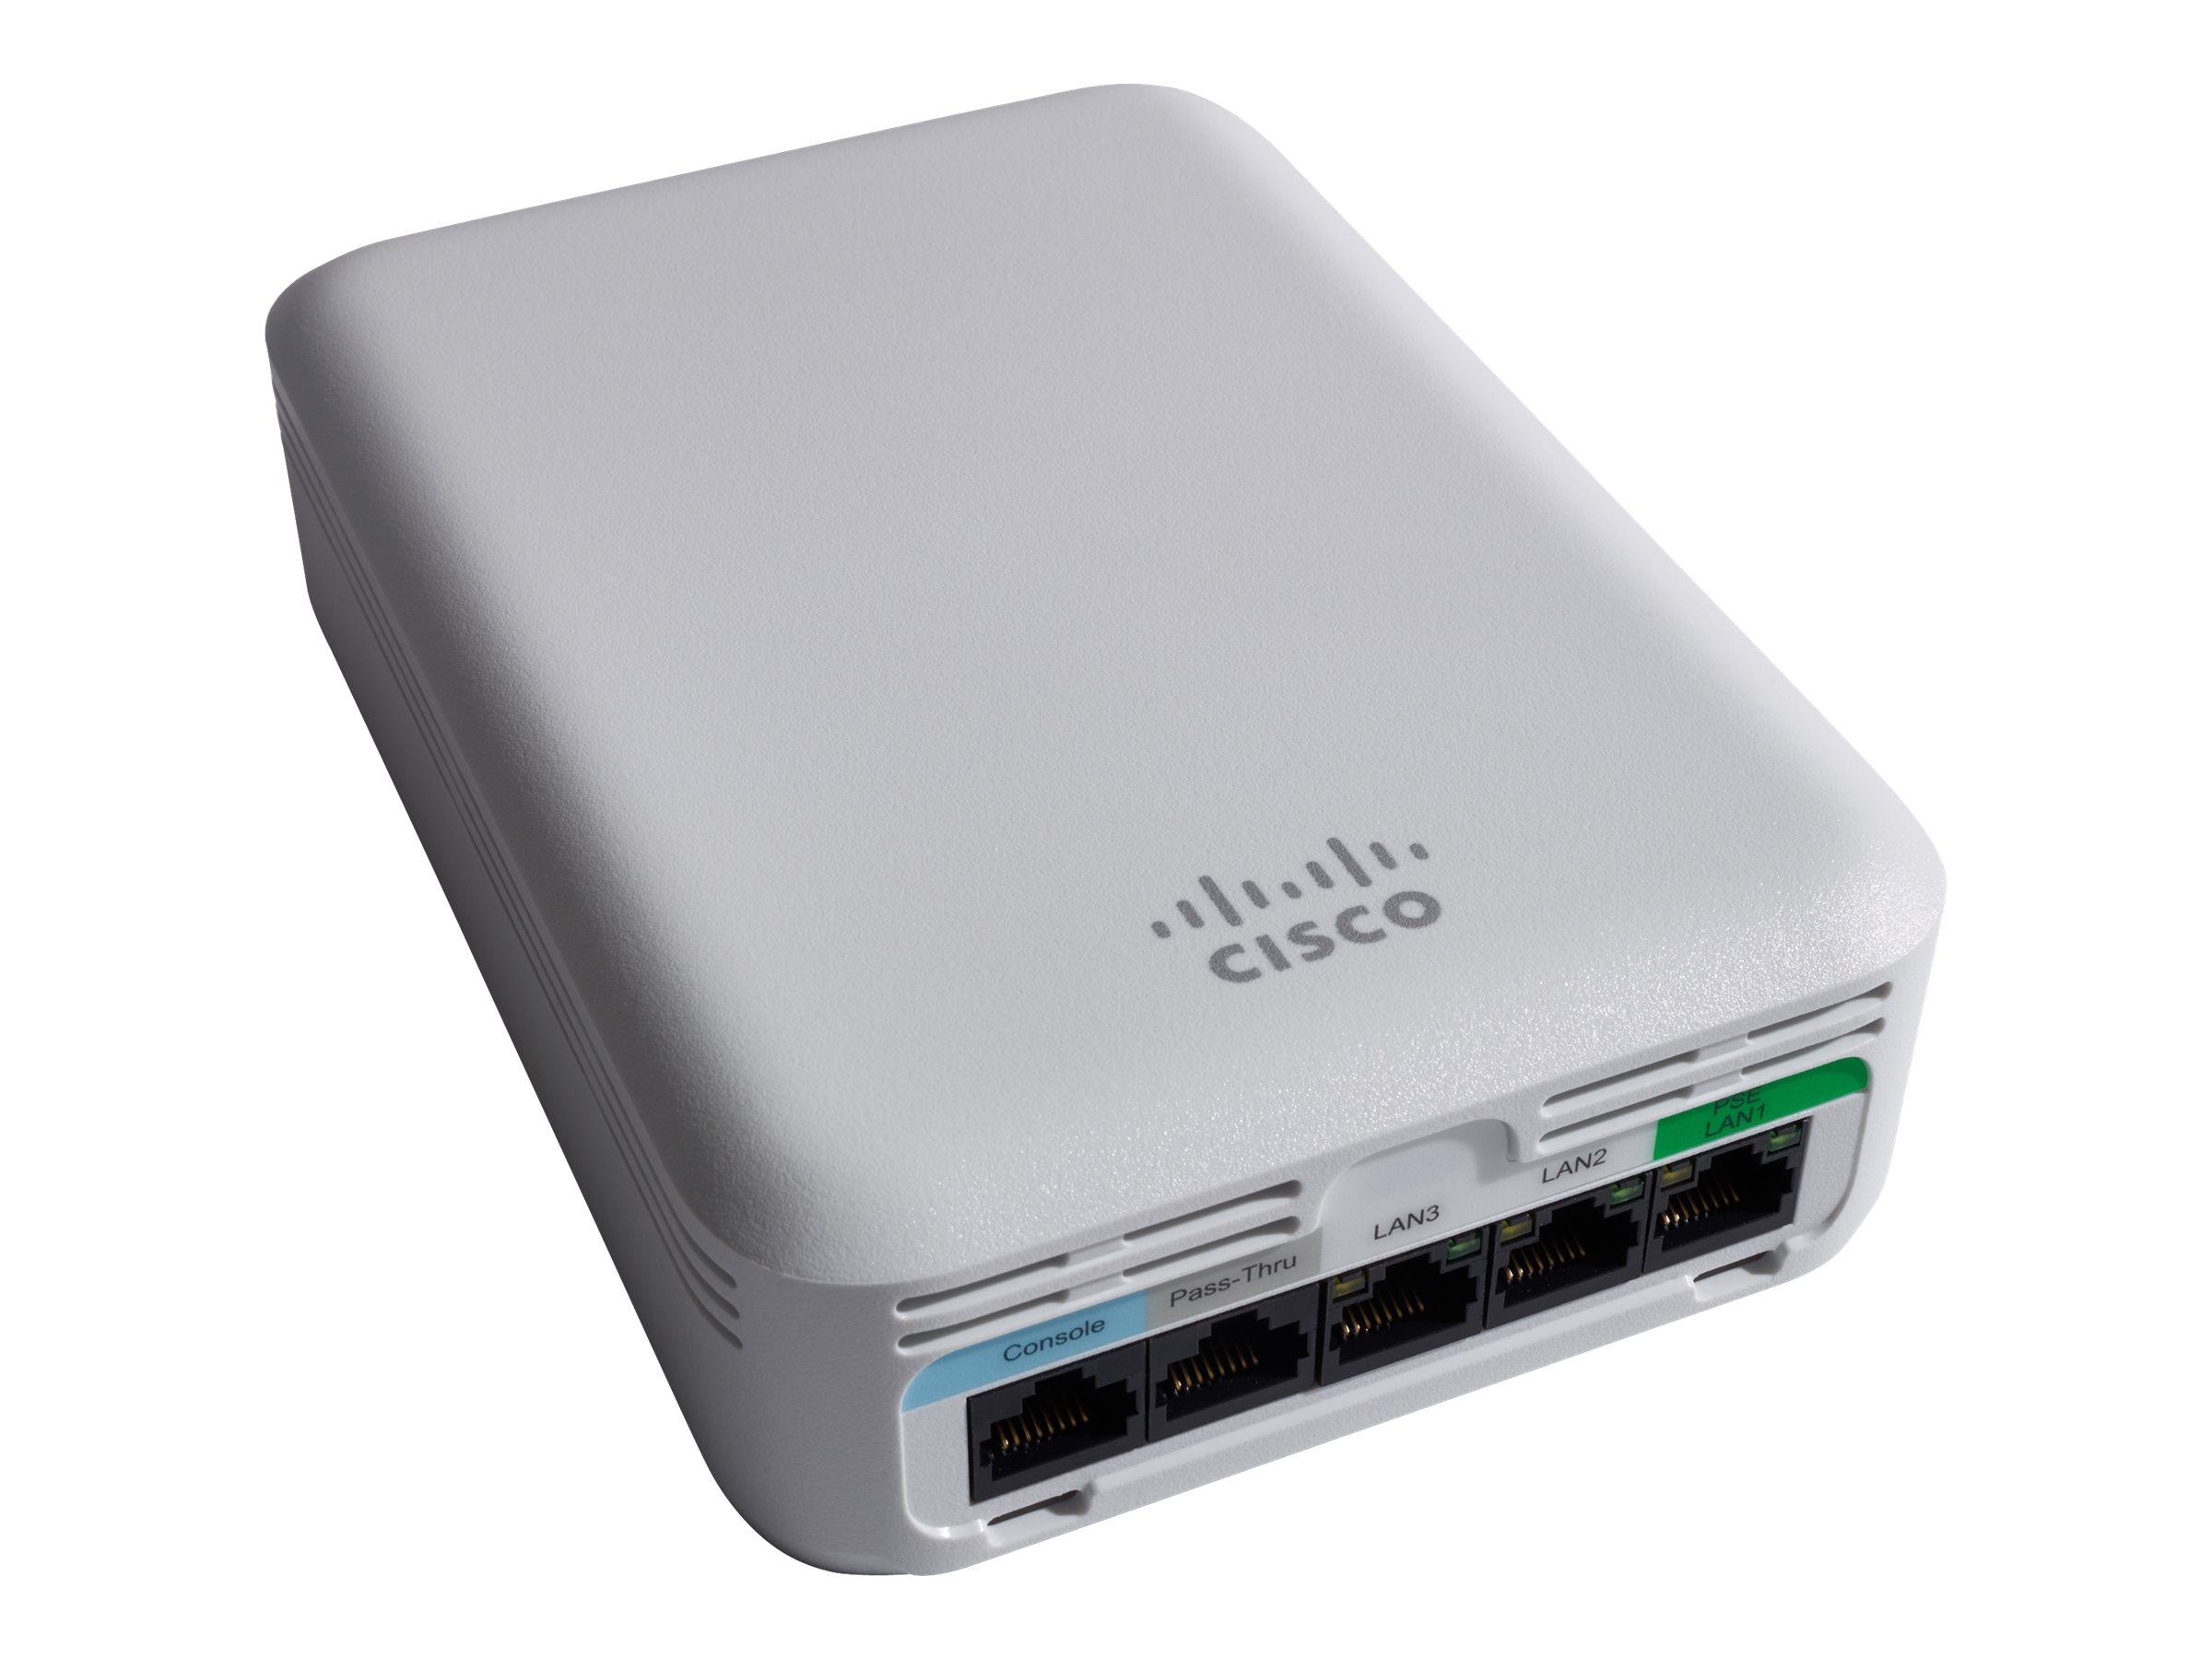 Cisco Aironet 1810W - Funkbasisstation - Bluetooth 4.1, 802.11ac Wave 2 (draft 5.0)